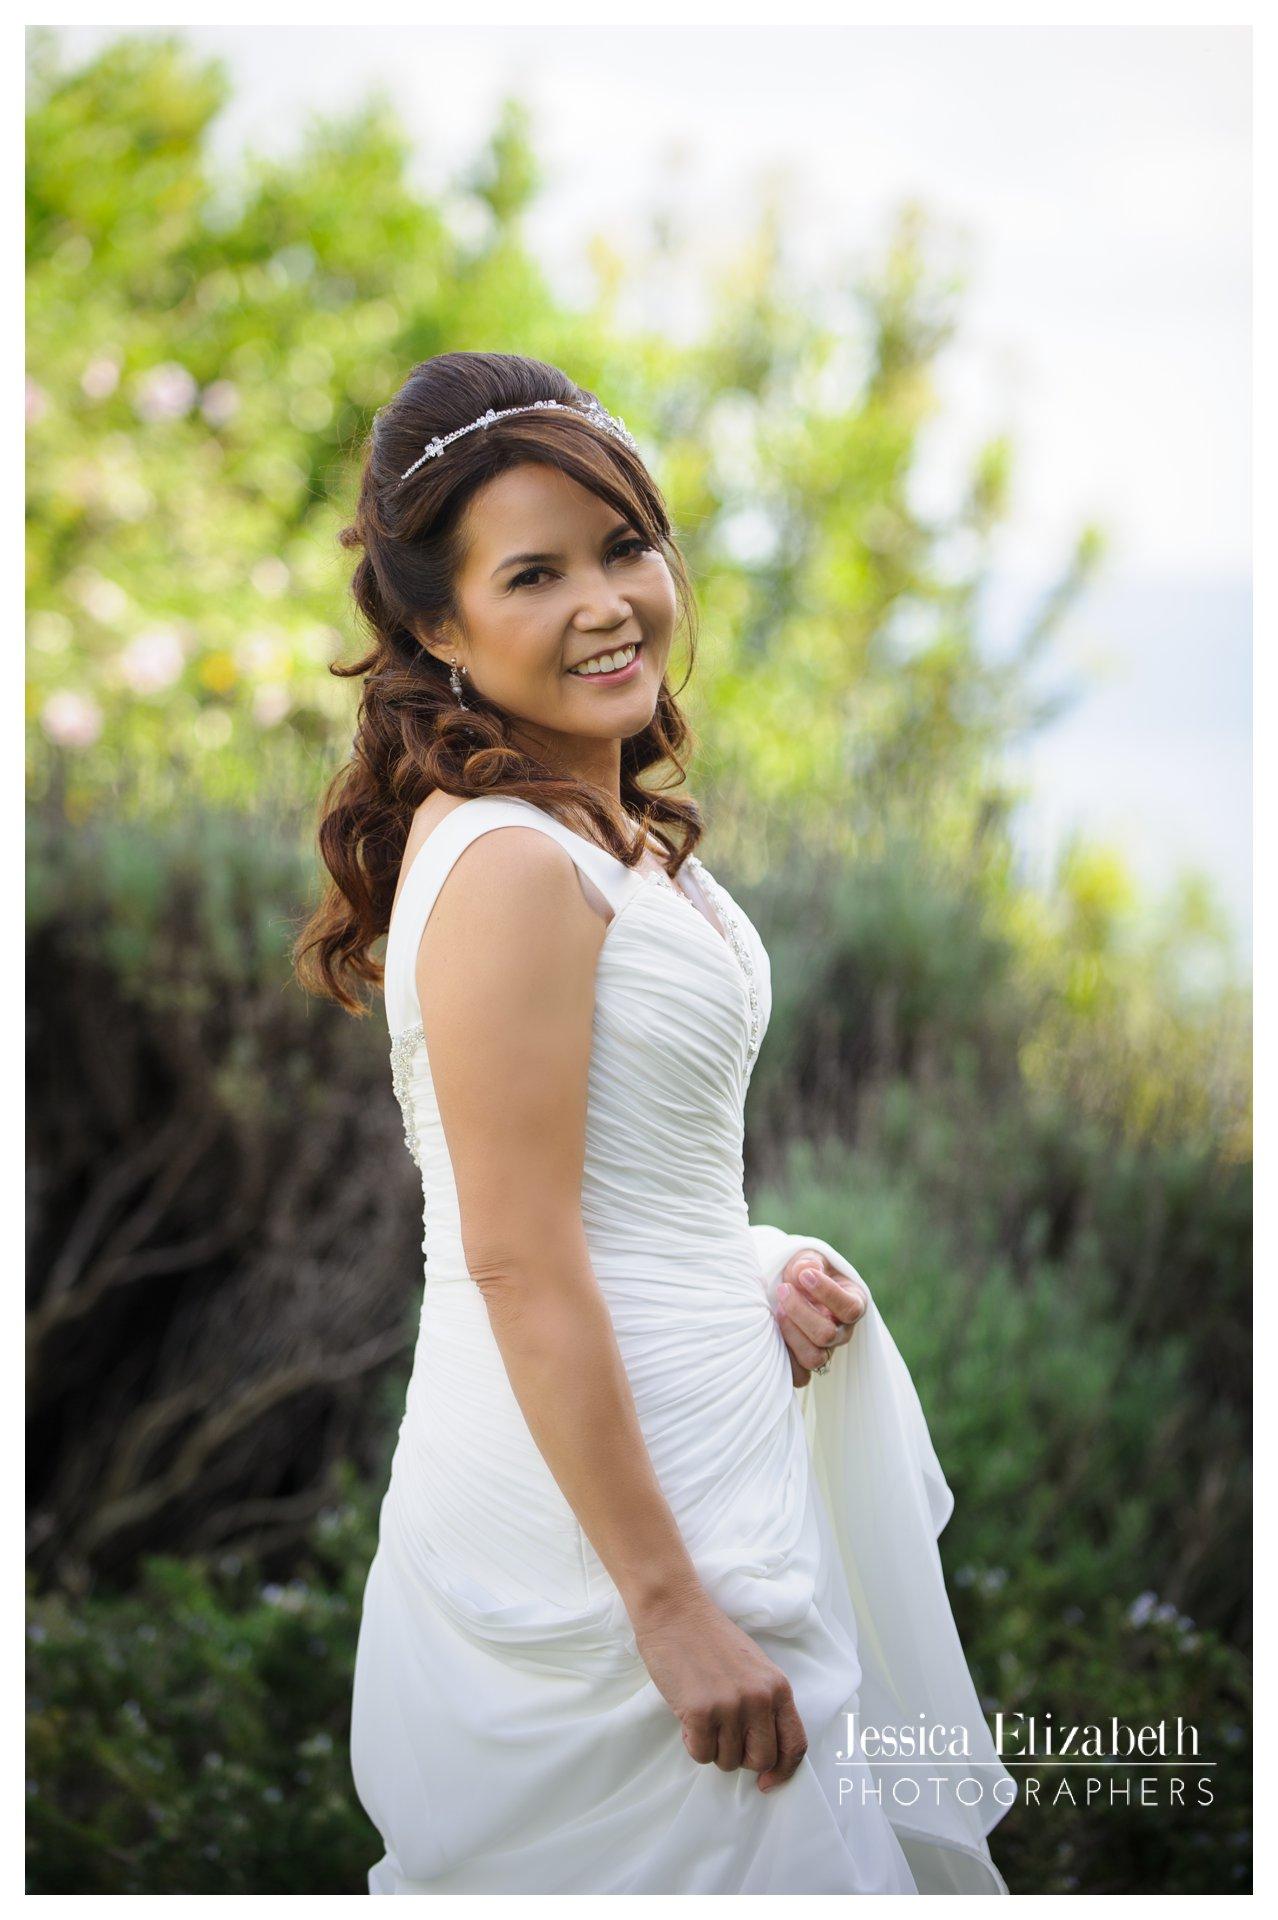 02-Terranea-Palos-Verdes-Wedding-Photography-by-Jessica-Elizabeth-w.jpg